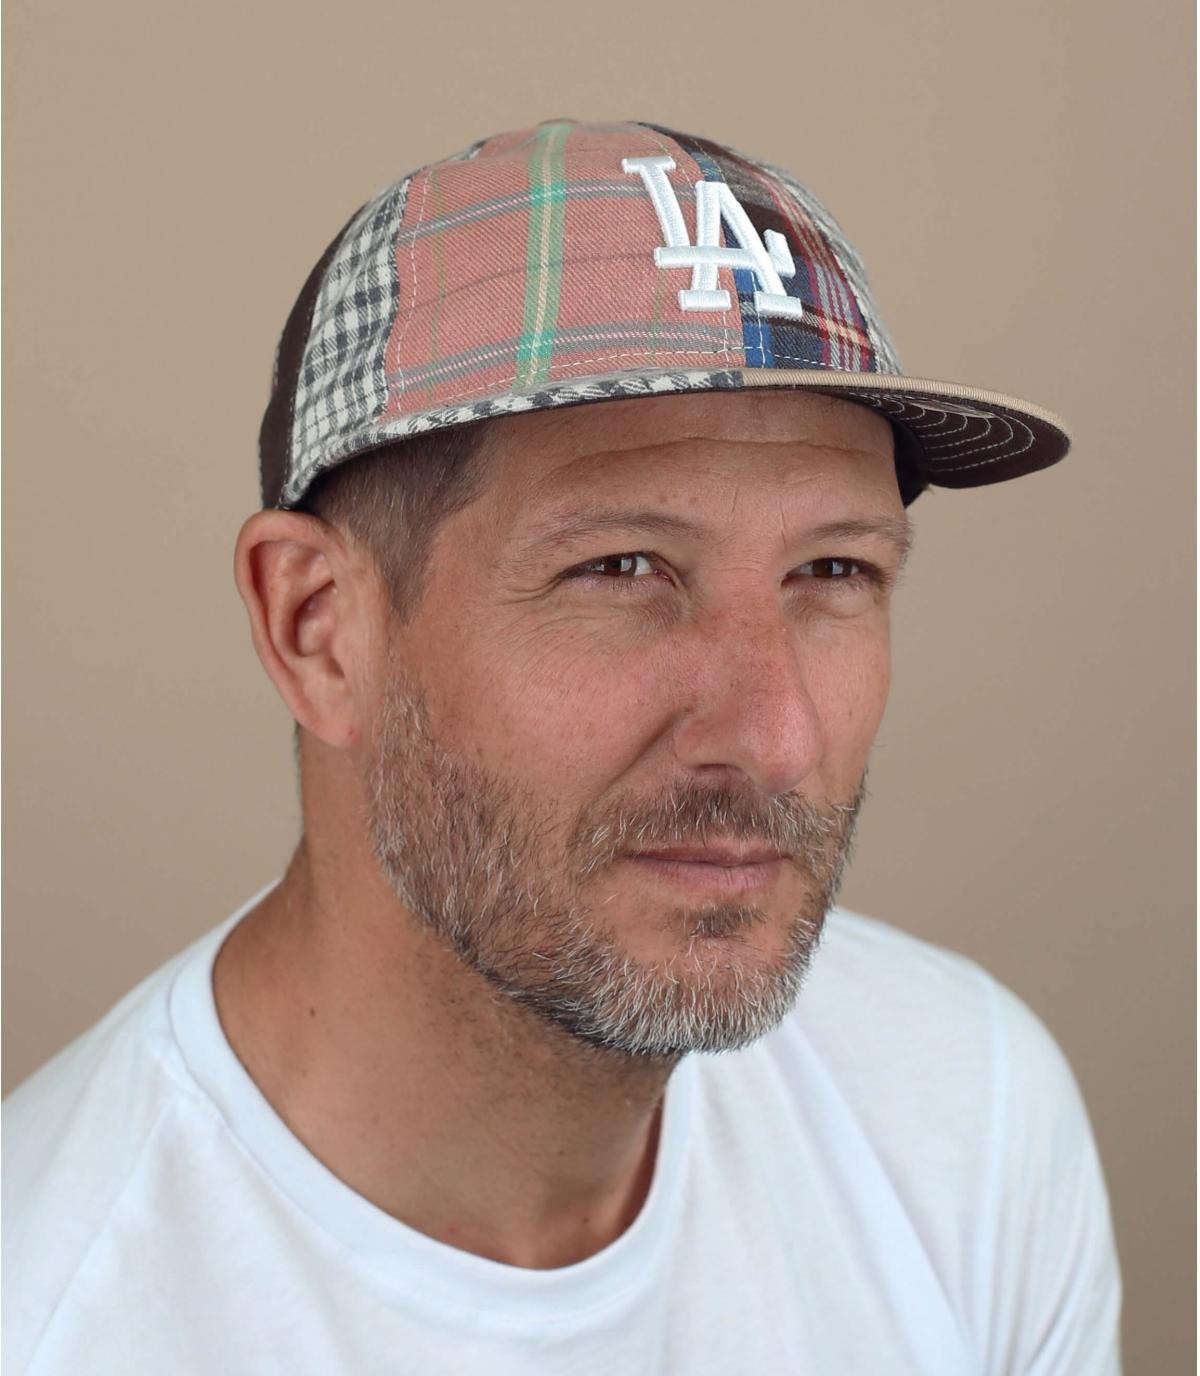 Beige LA patchwork cap